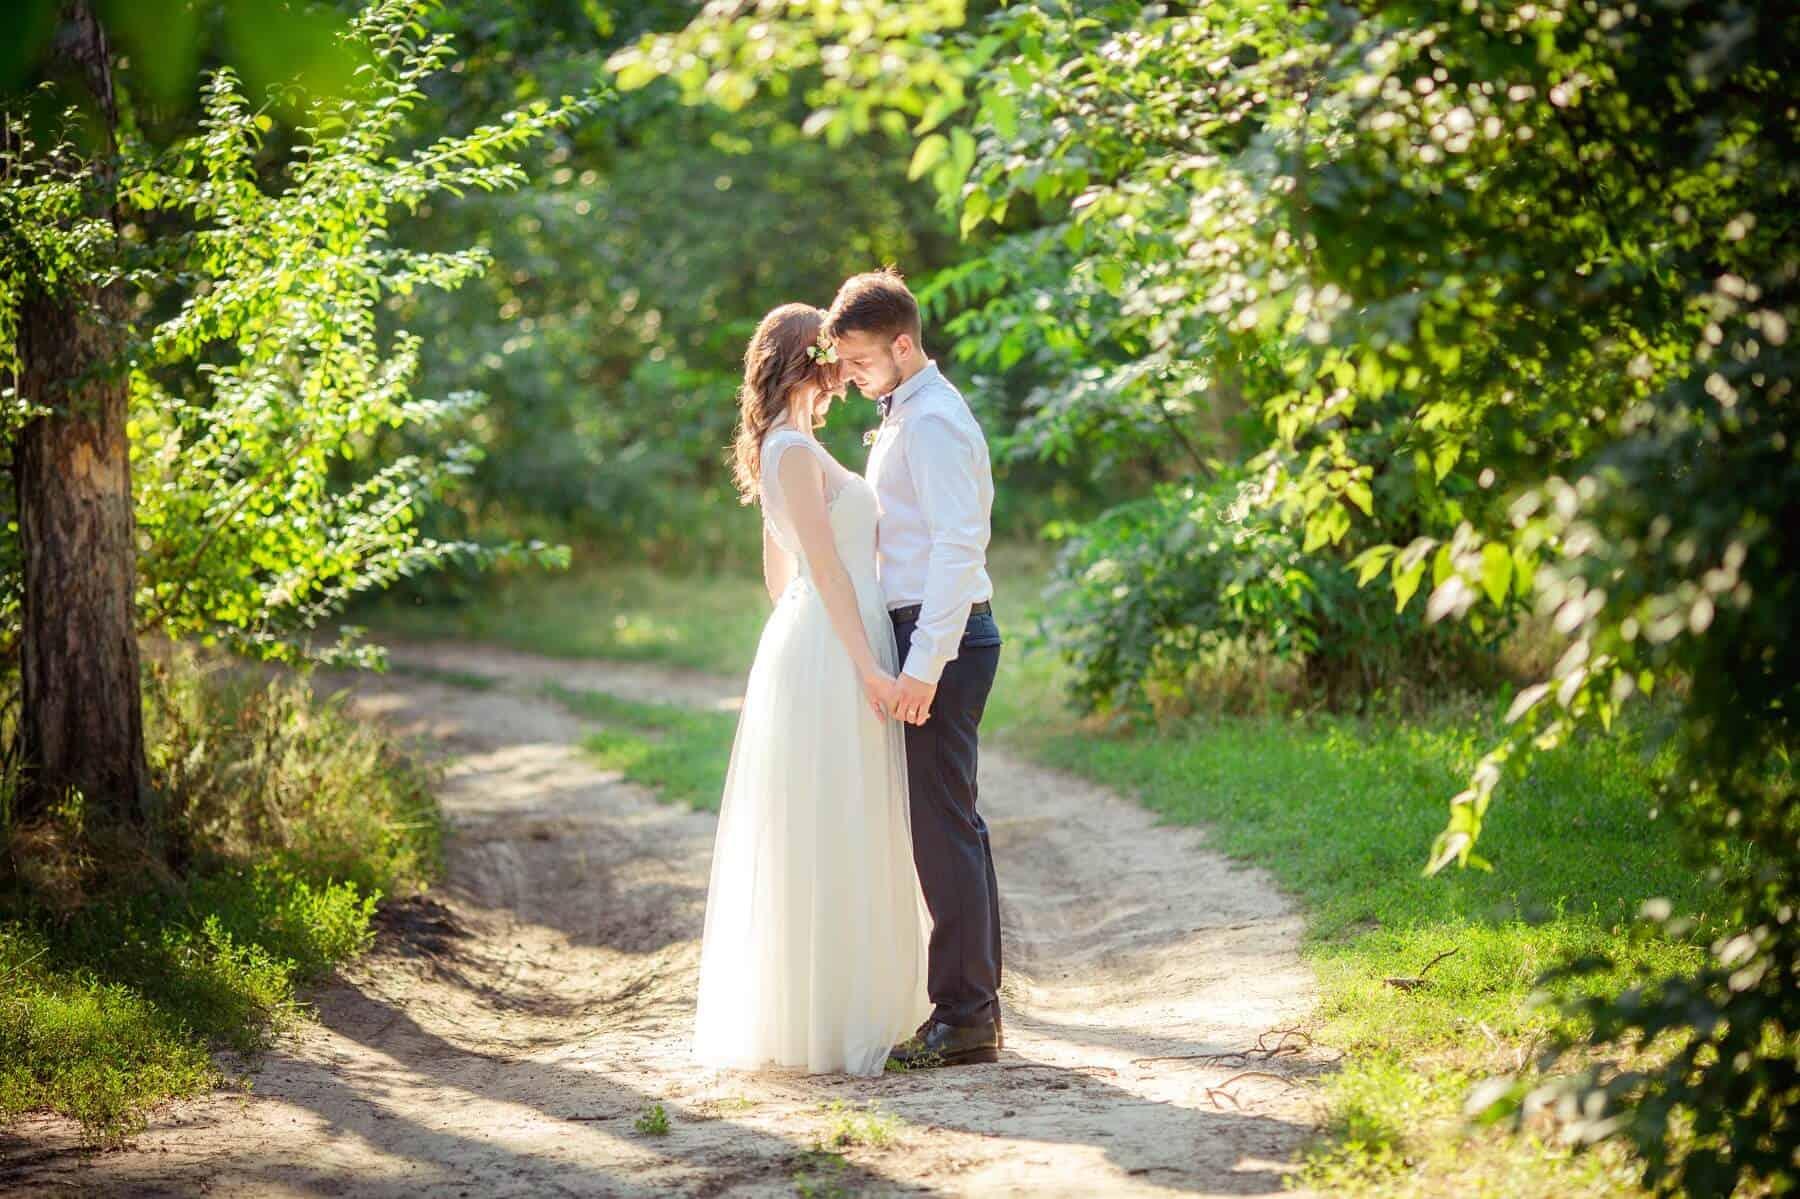 Novomanželé v lese